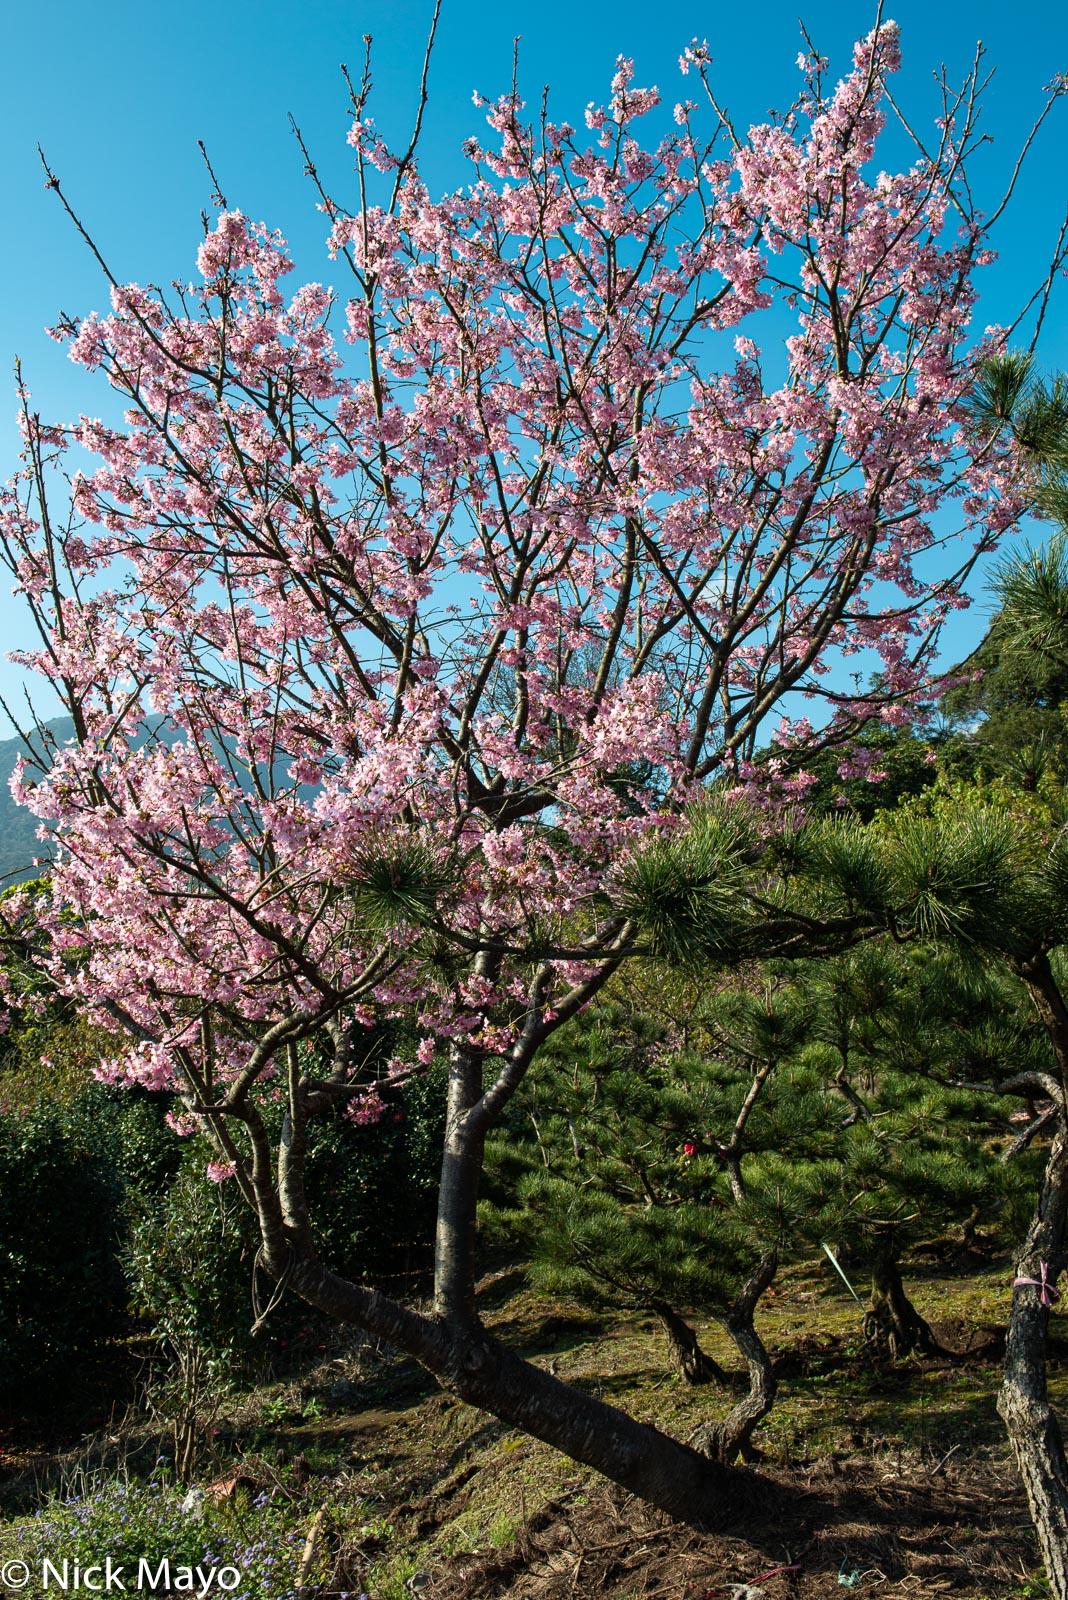 A Yoshino cherry tree in bloom in Yangmingshan.